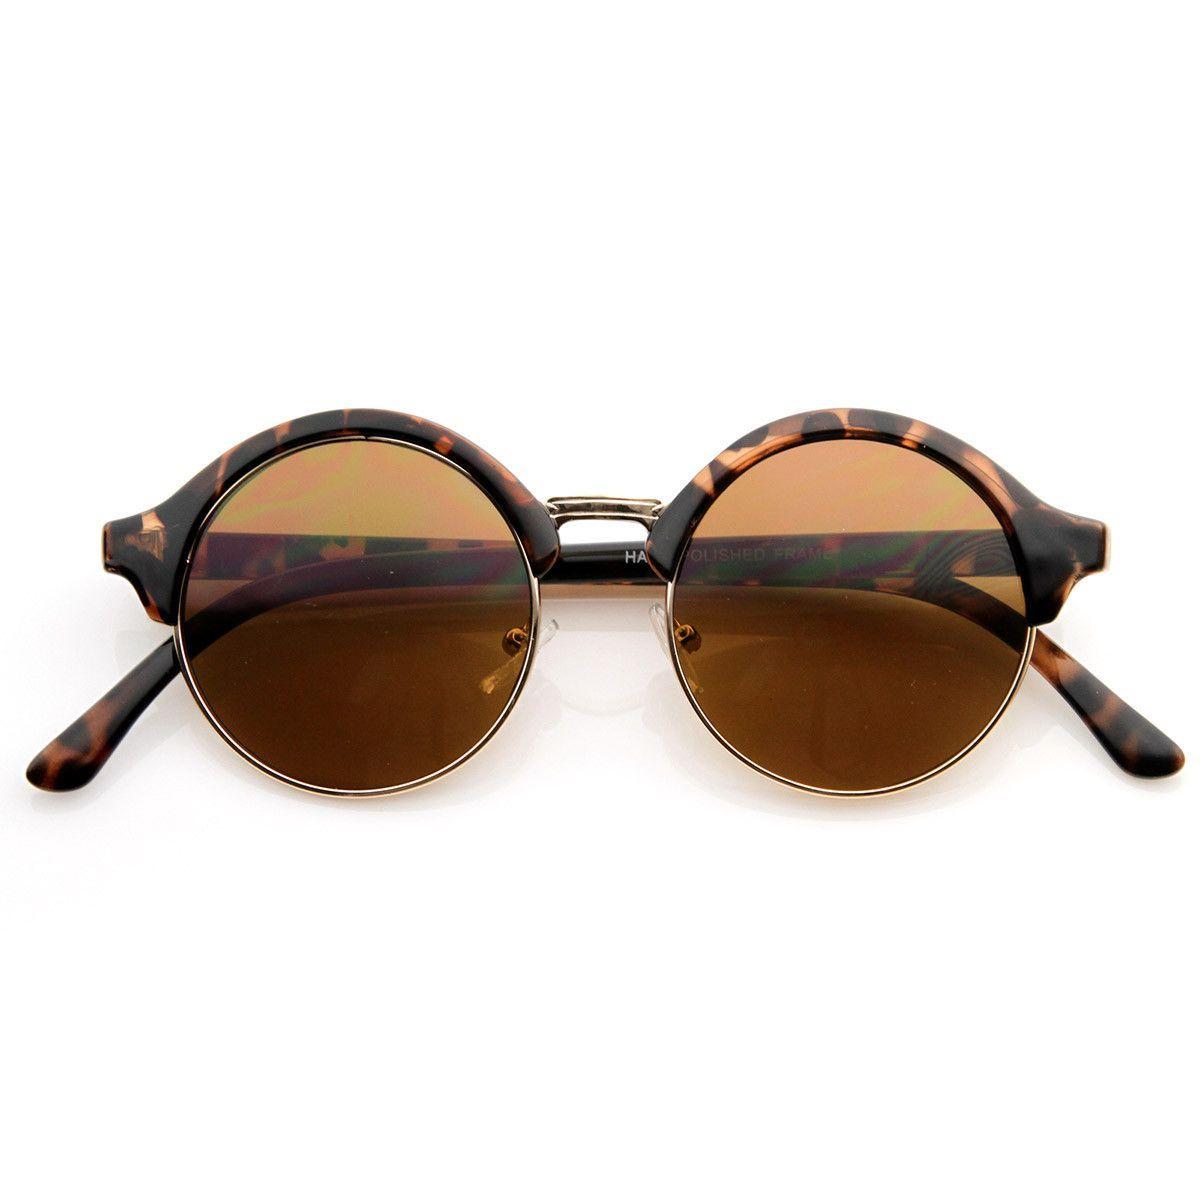 Vintage Inspired Classic Half Frame Semi-Rimless Round Circle Sunglasses